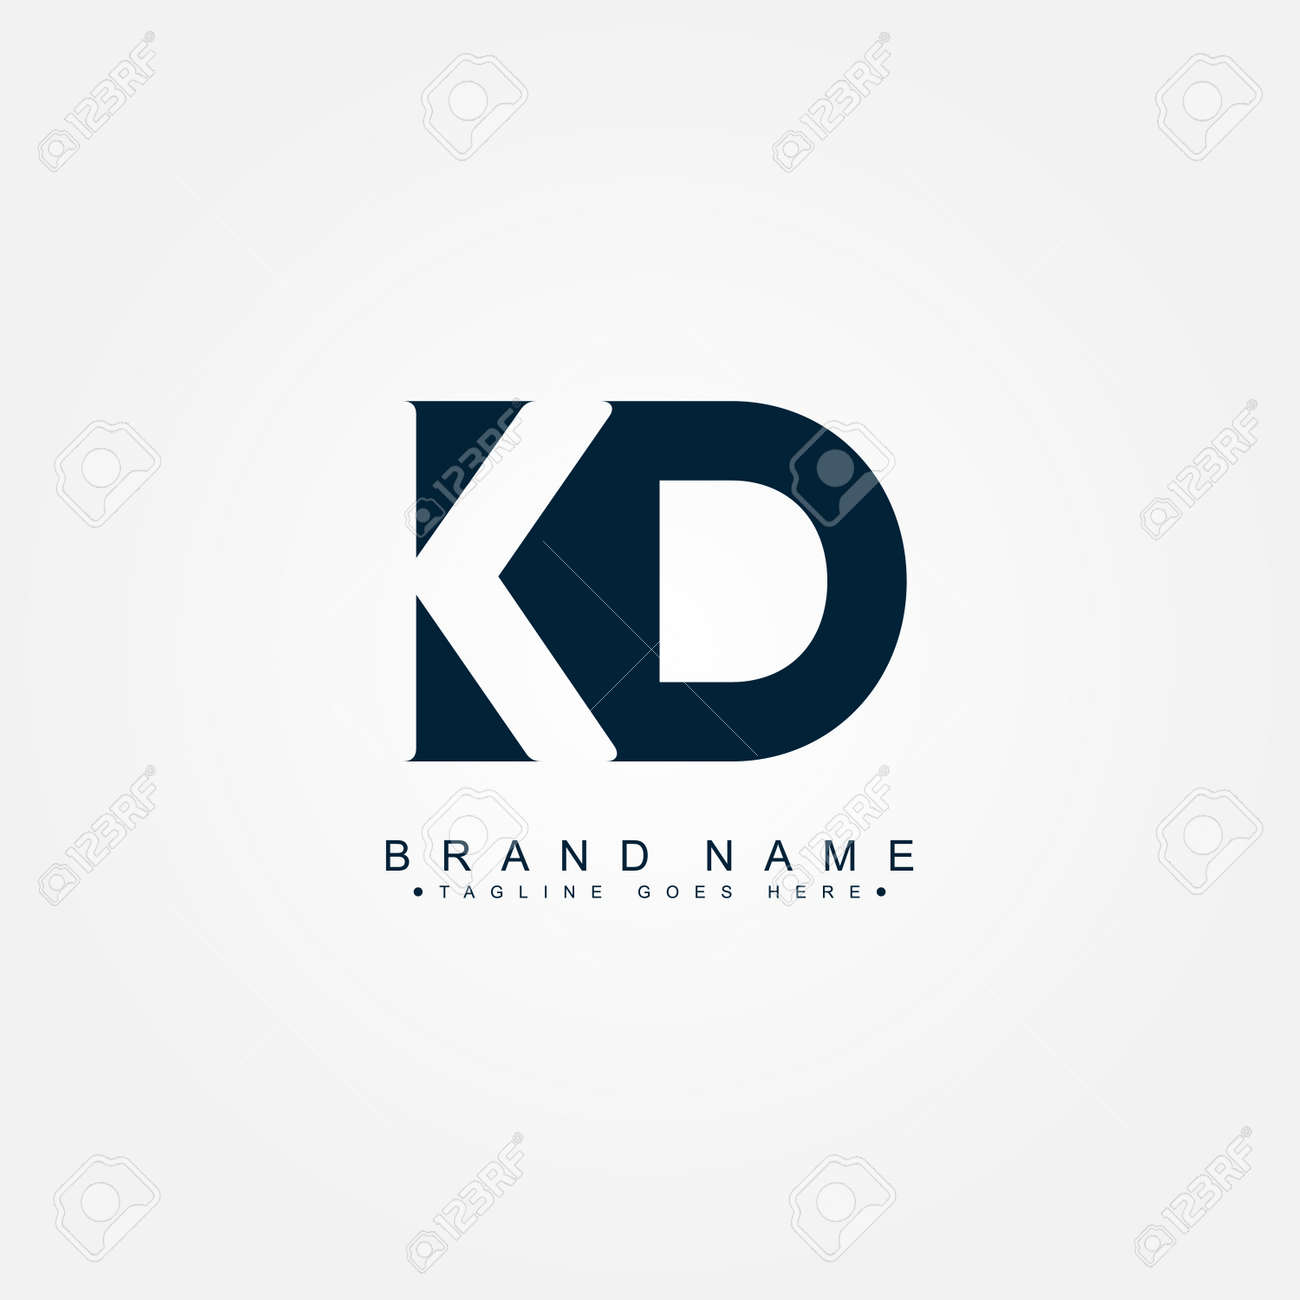 Initial Letter KD Logo - Minimal Business Logo - 169012499